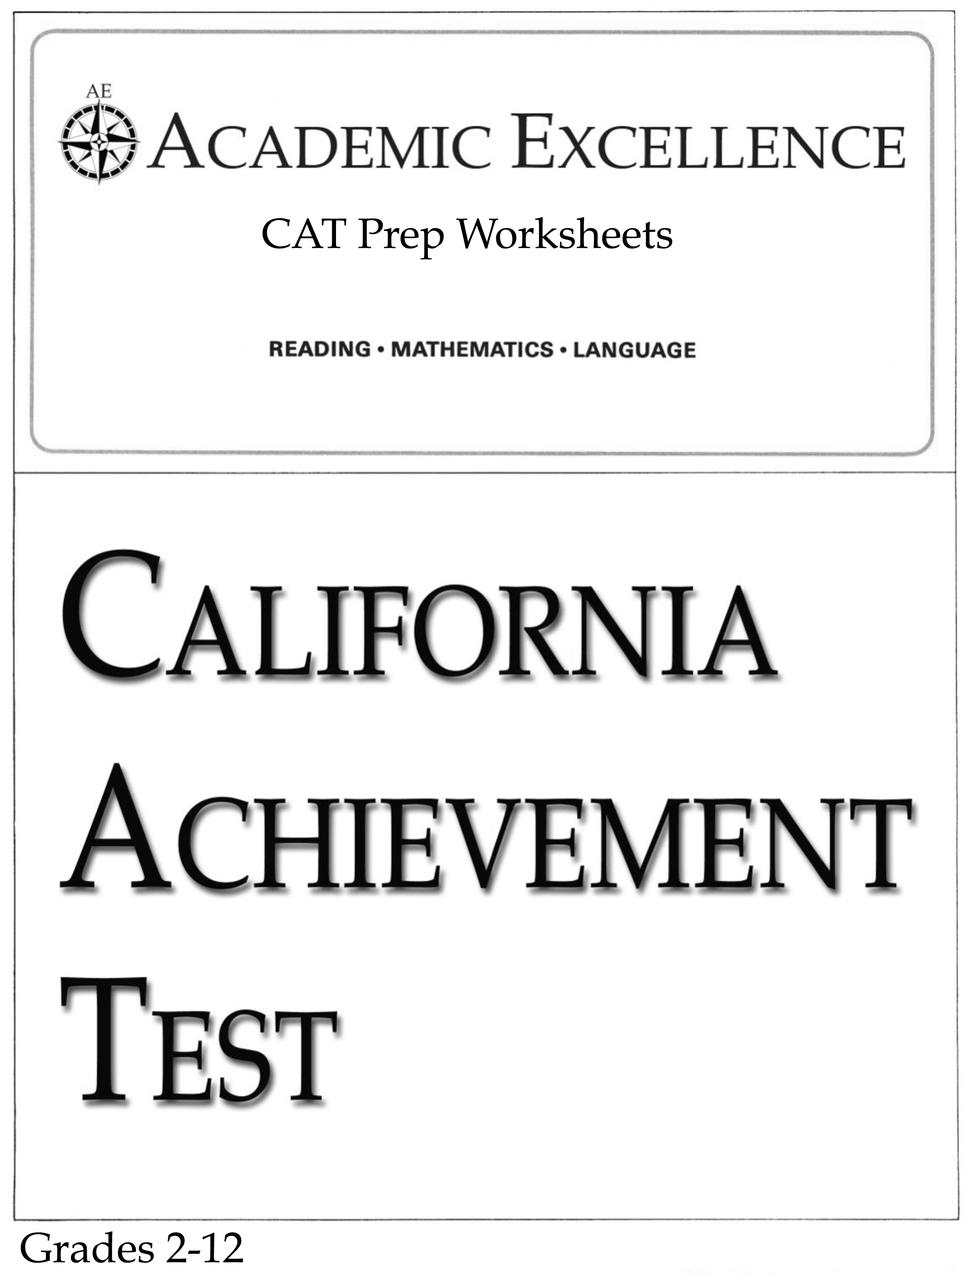 medium resolution of CAT Prep Pack: Grades 2 through 12 - PDF Download - Academic Excellence